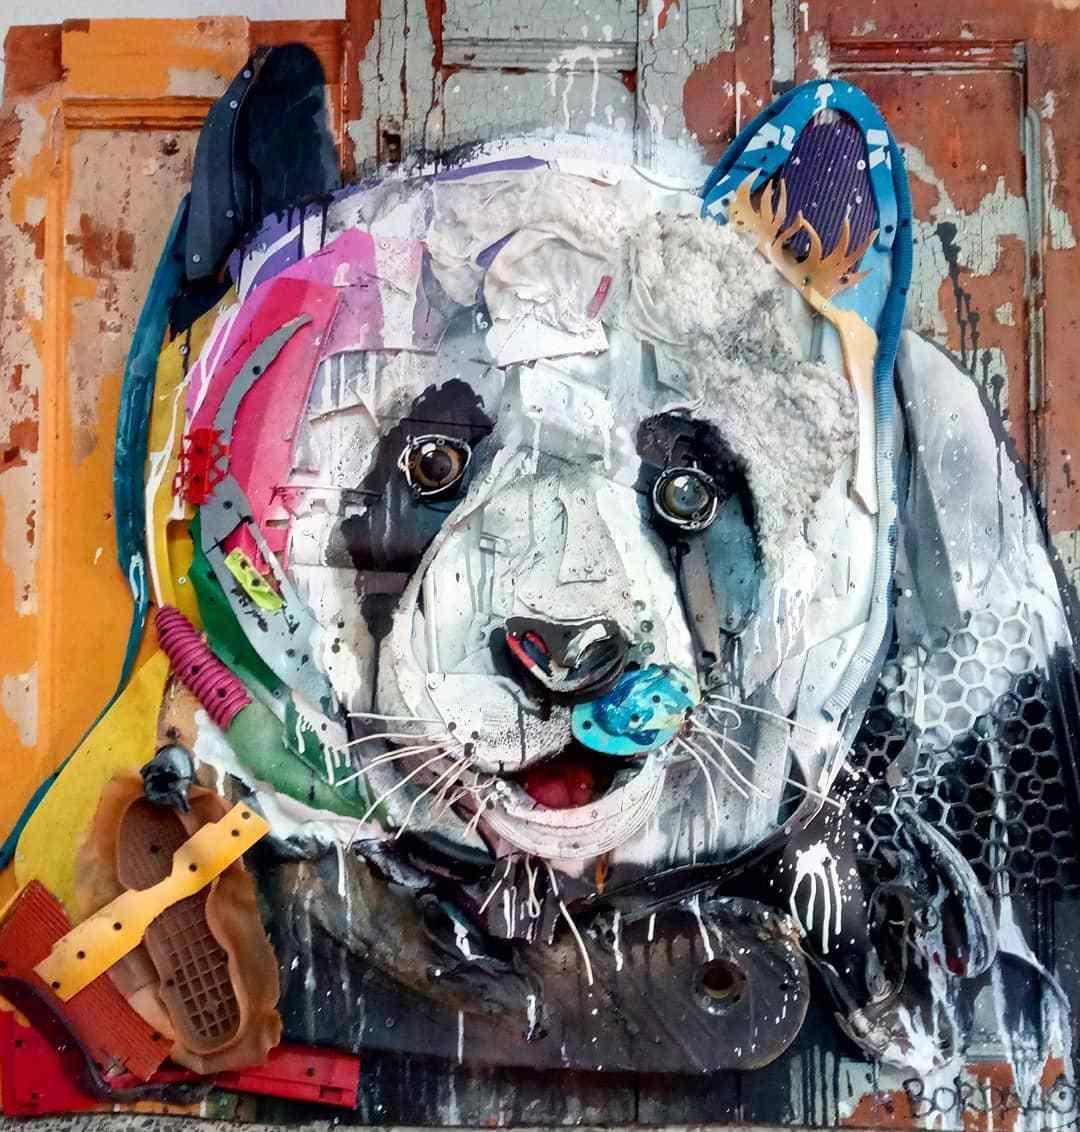 Trash Animal Street Art Art, Trash art, Waste art